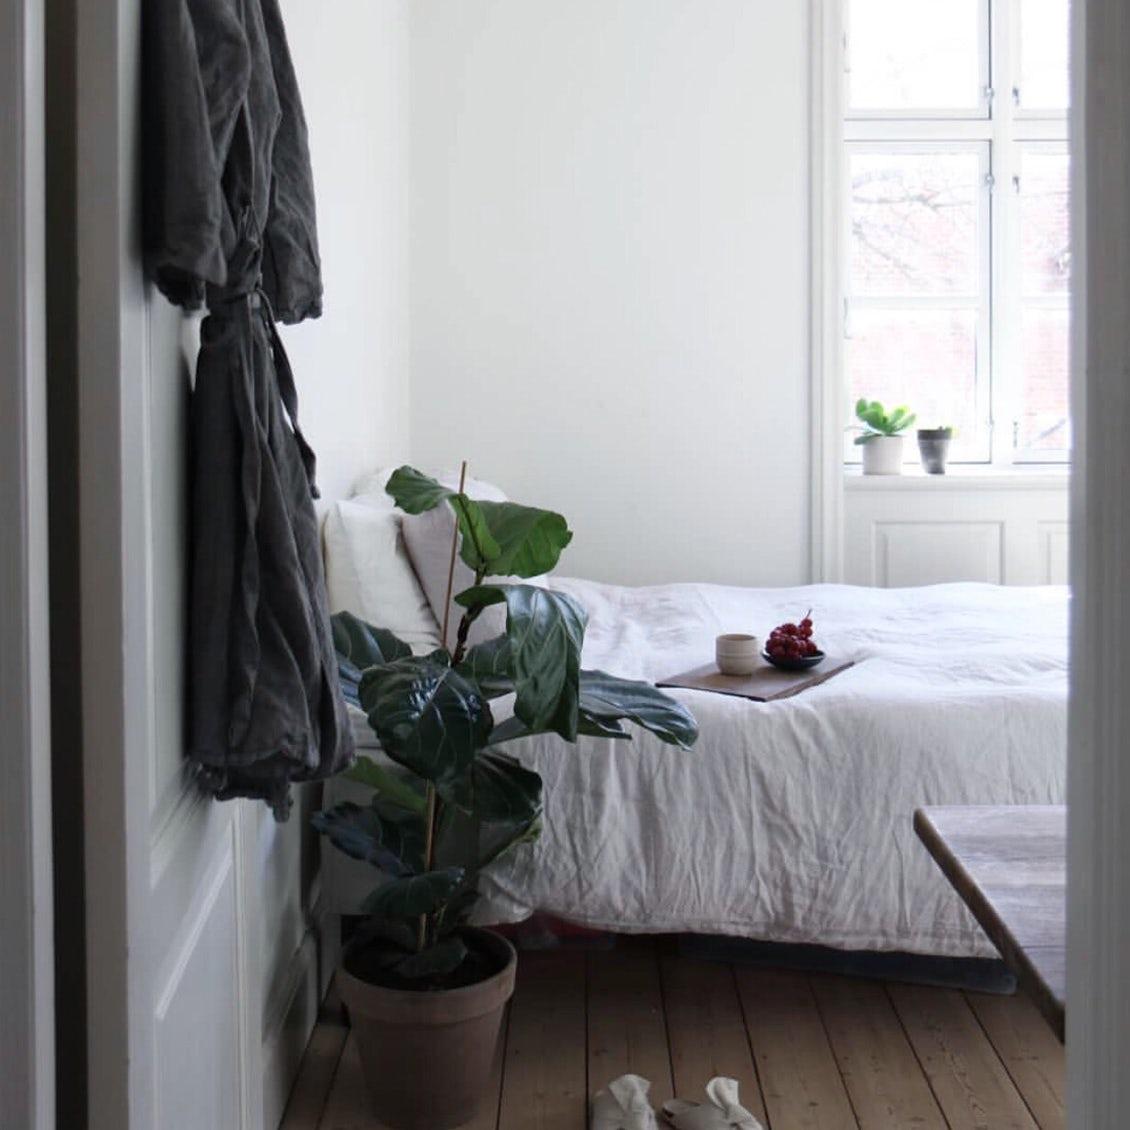 【BRAND NOTE】ベッドルームを居心地よく整えるヒントは、北欧デンマークにありました